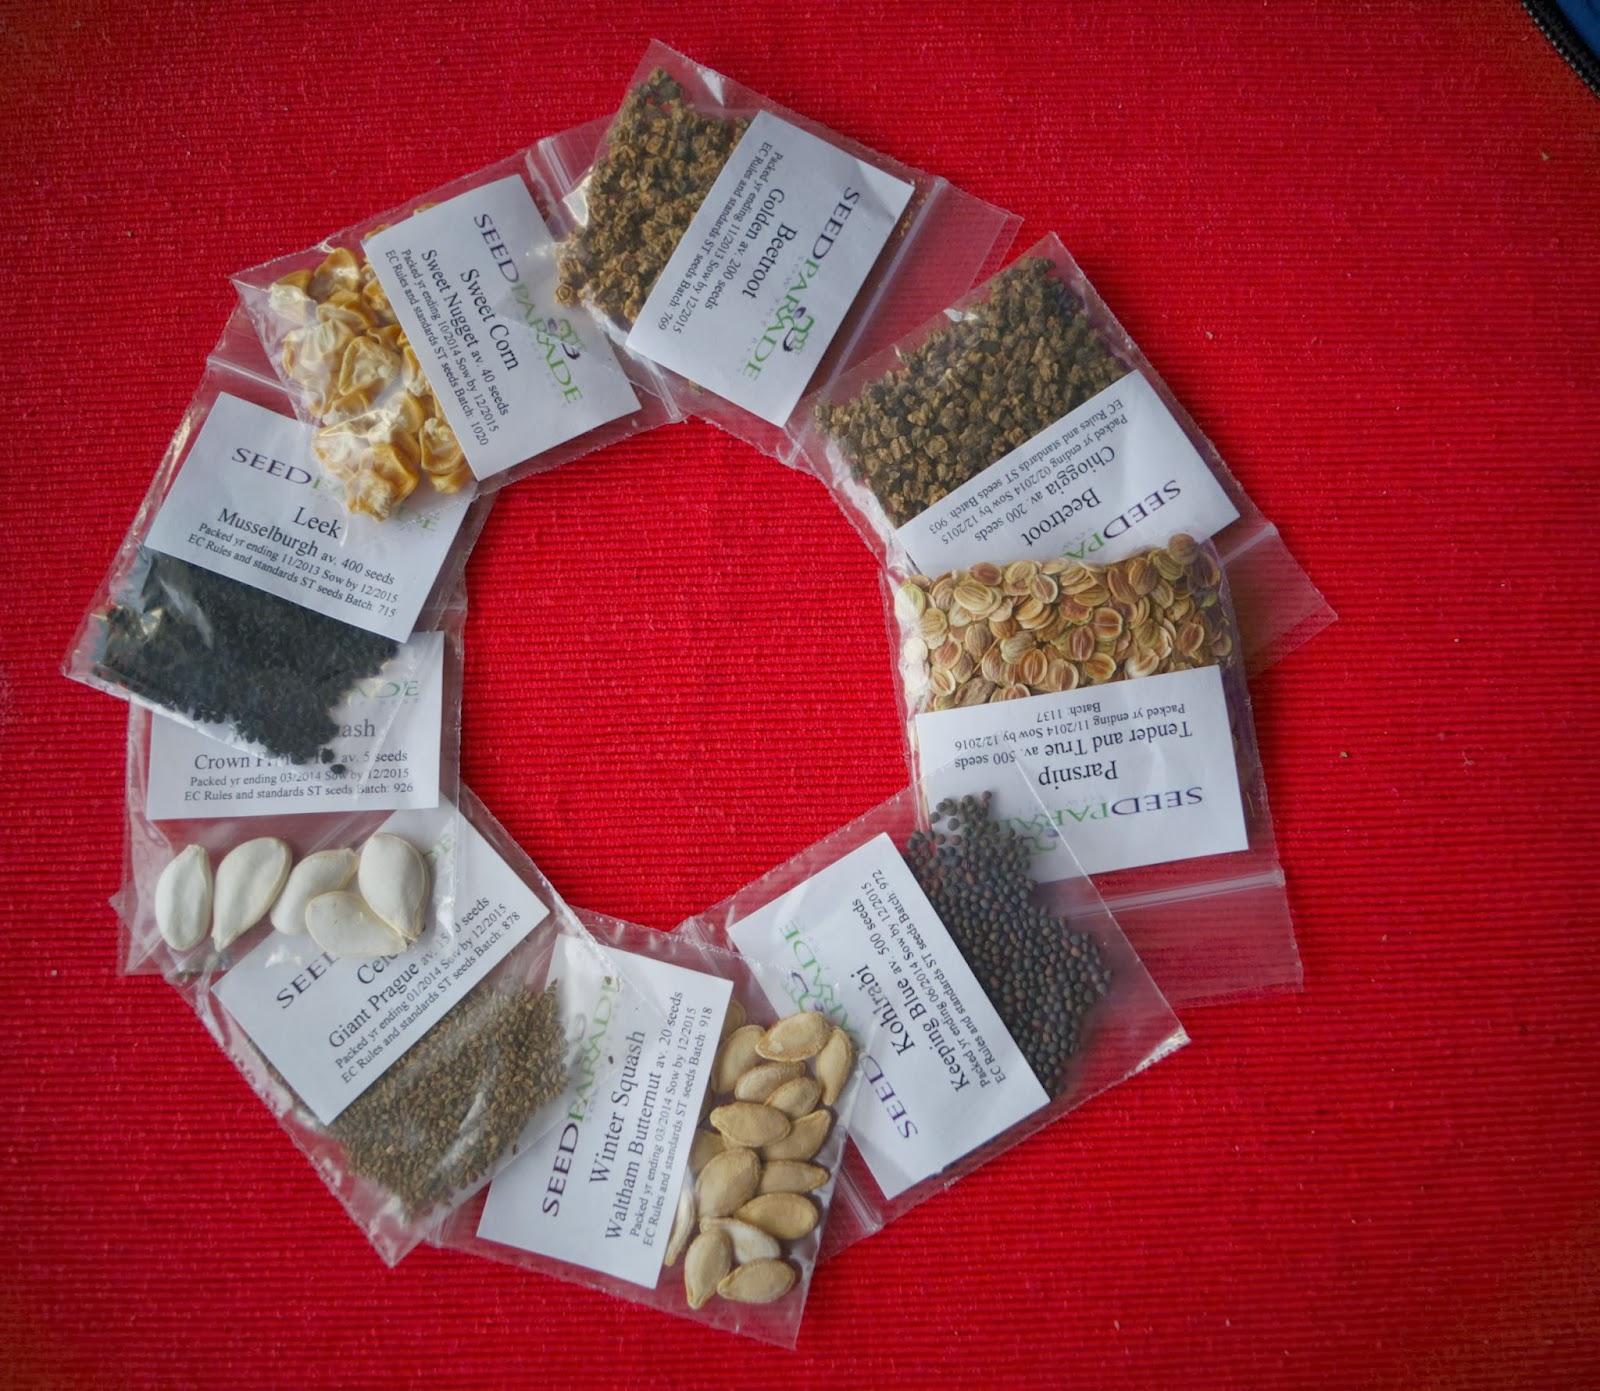 Veggie Seeds 1 - 'Grow Our Own' Allotment blog 2014